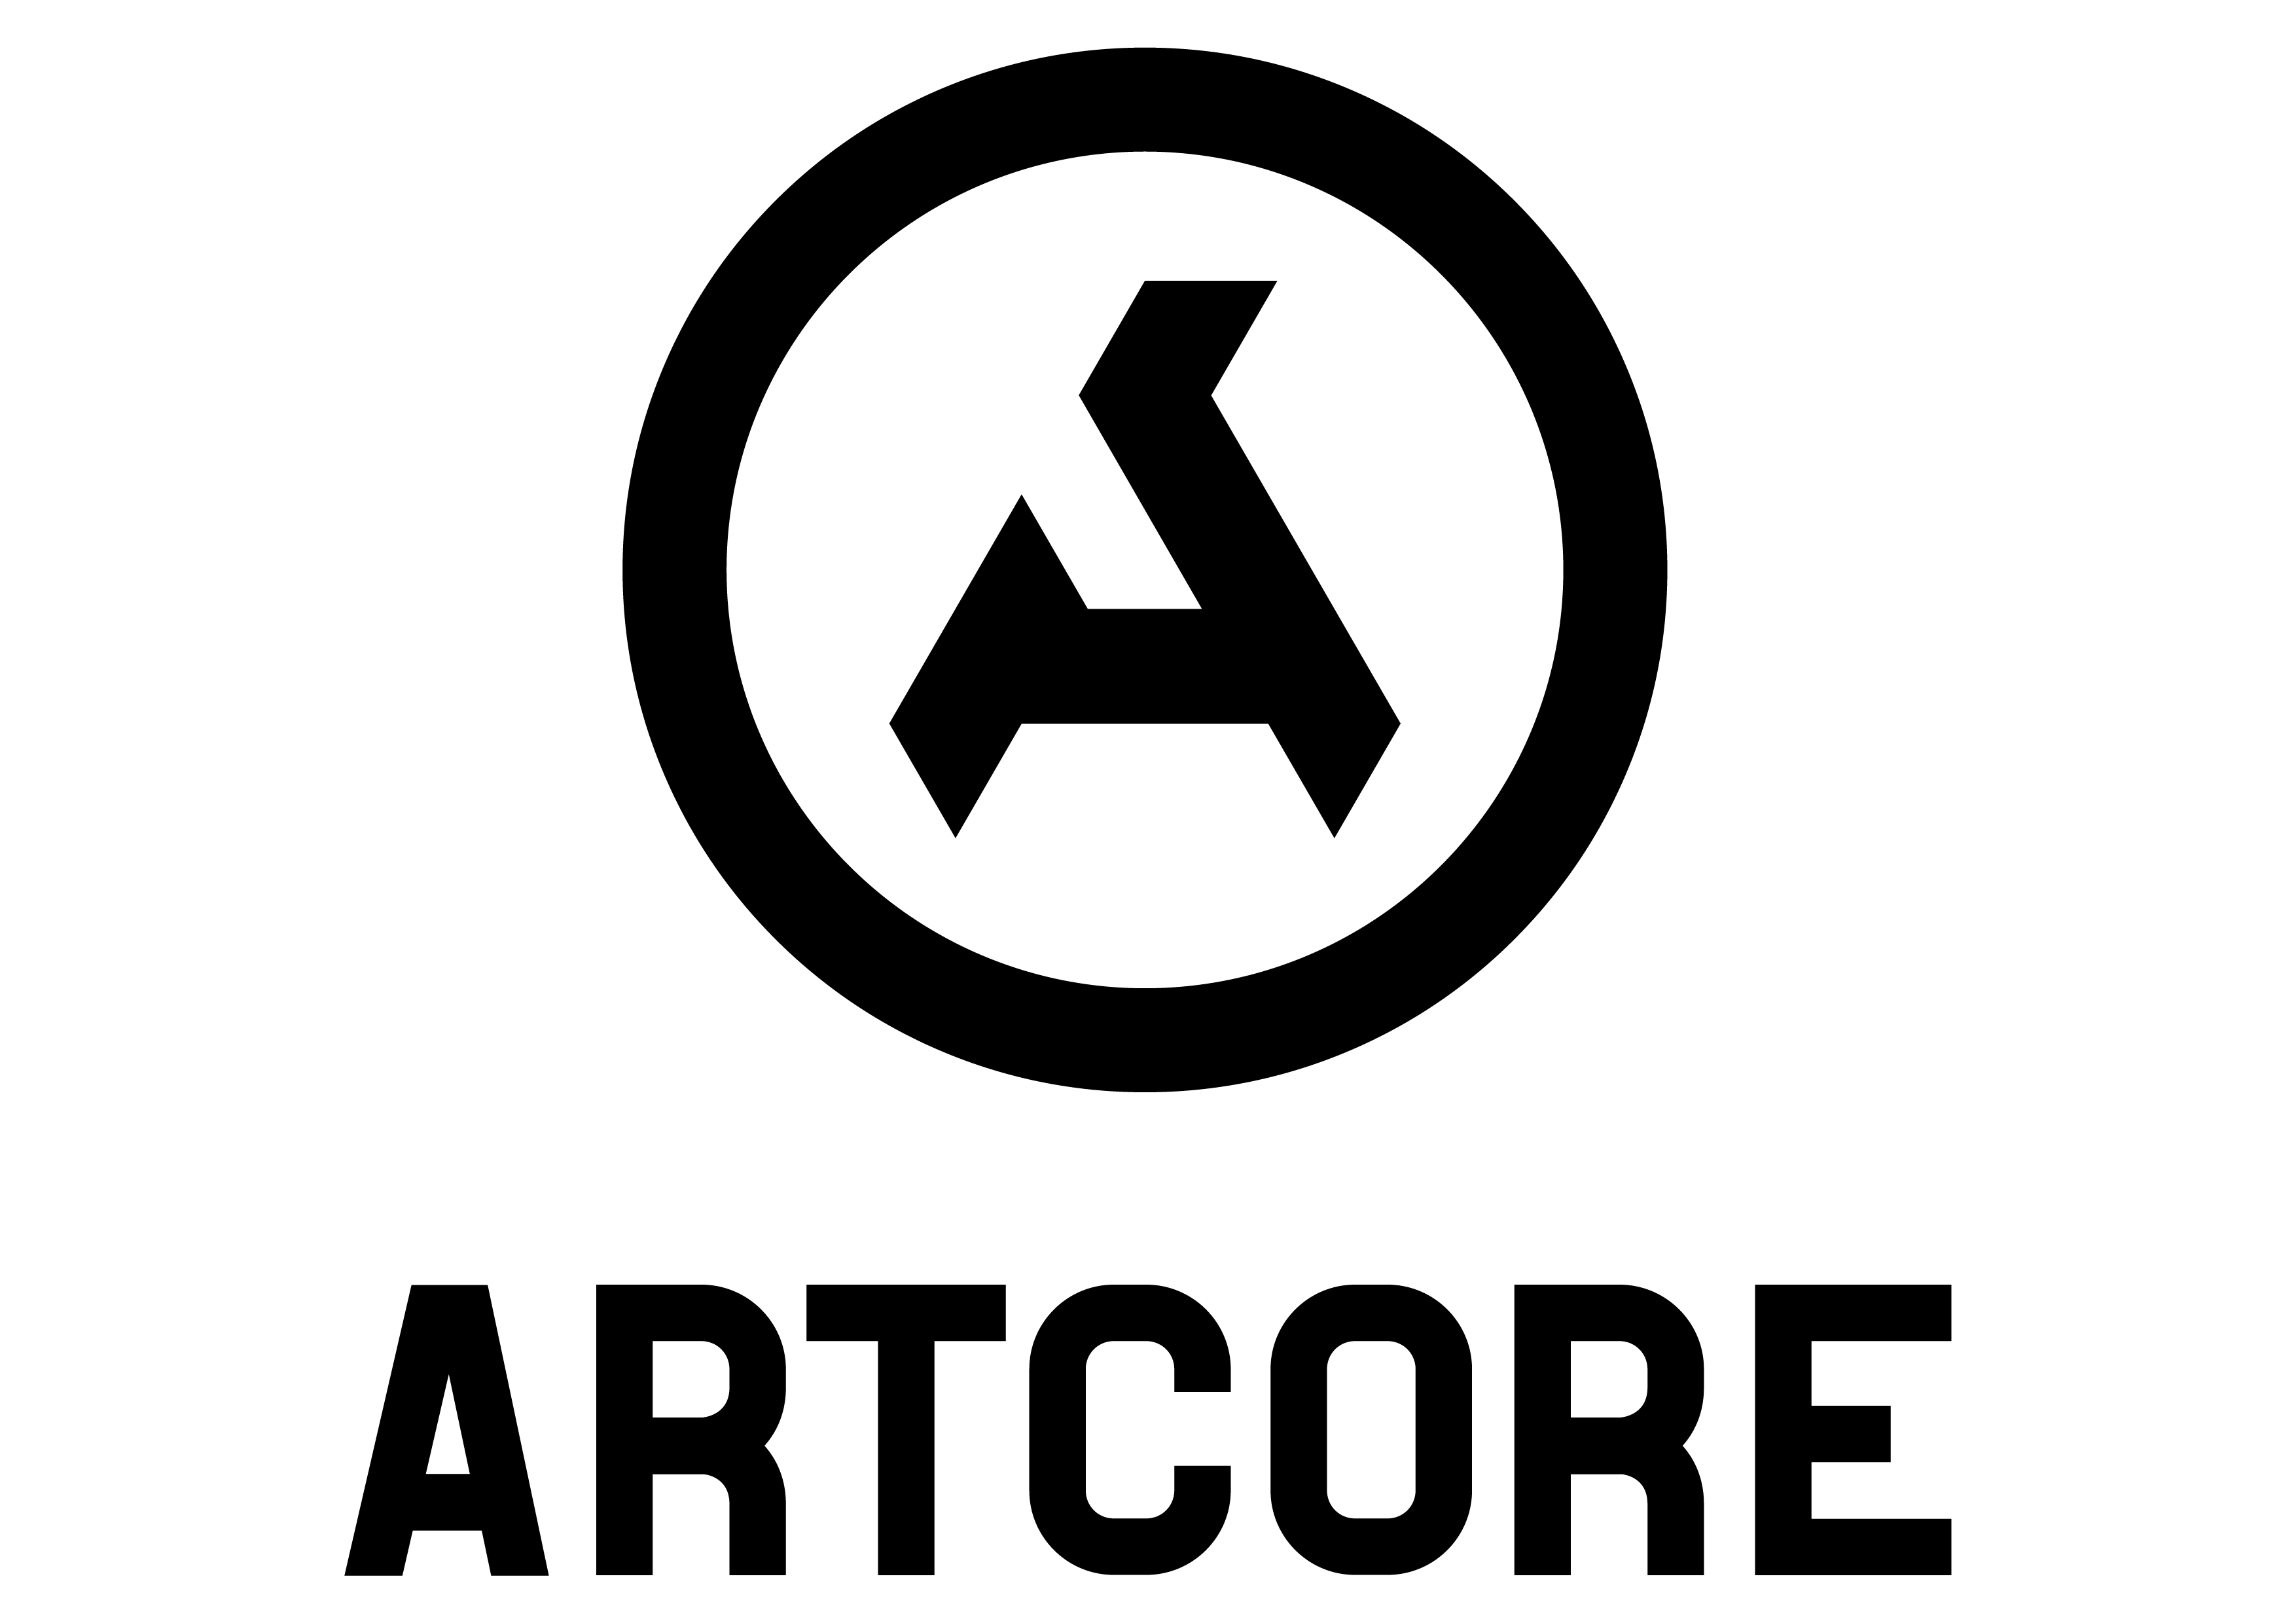 artcore_logo_black